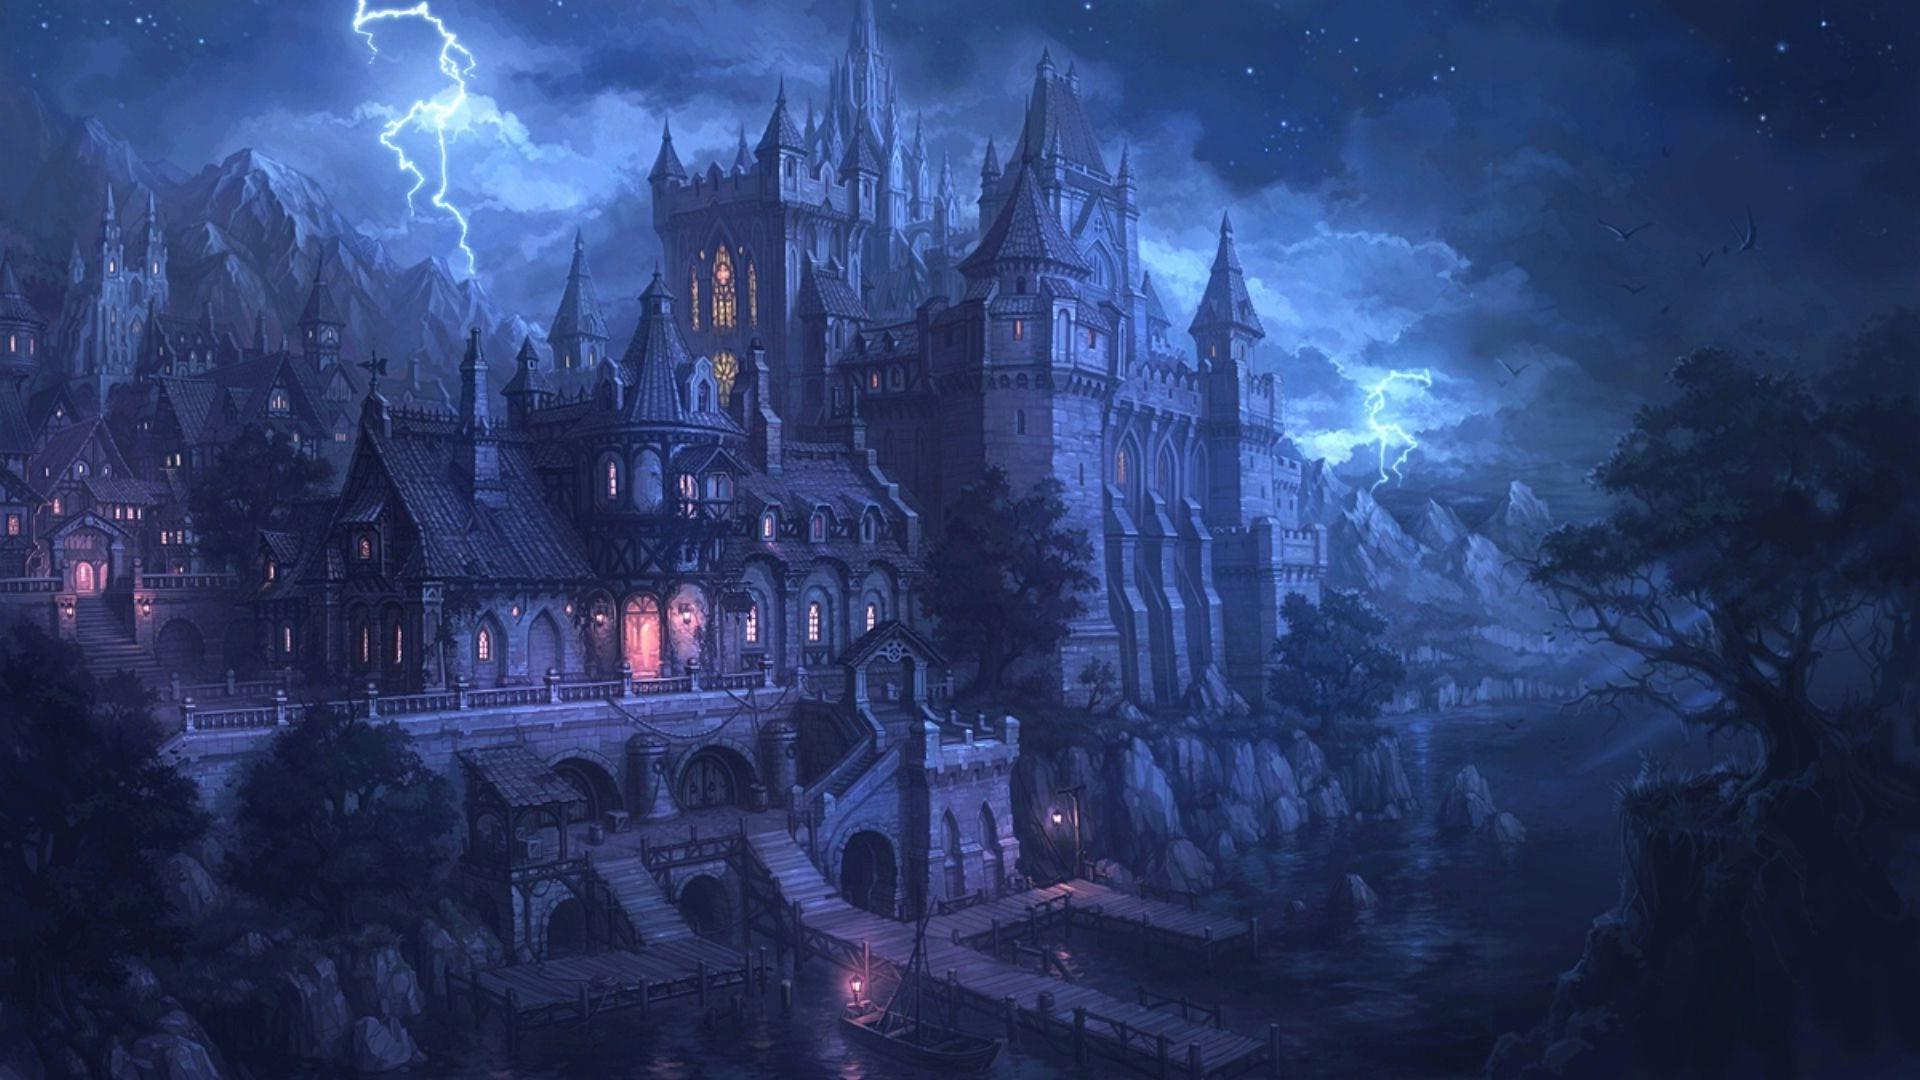 Gothic Desktop Backgrounds 53 Images